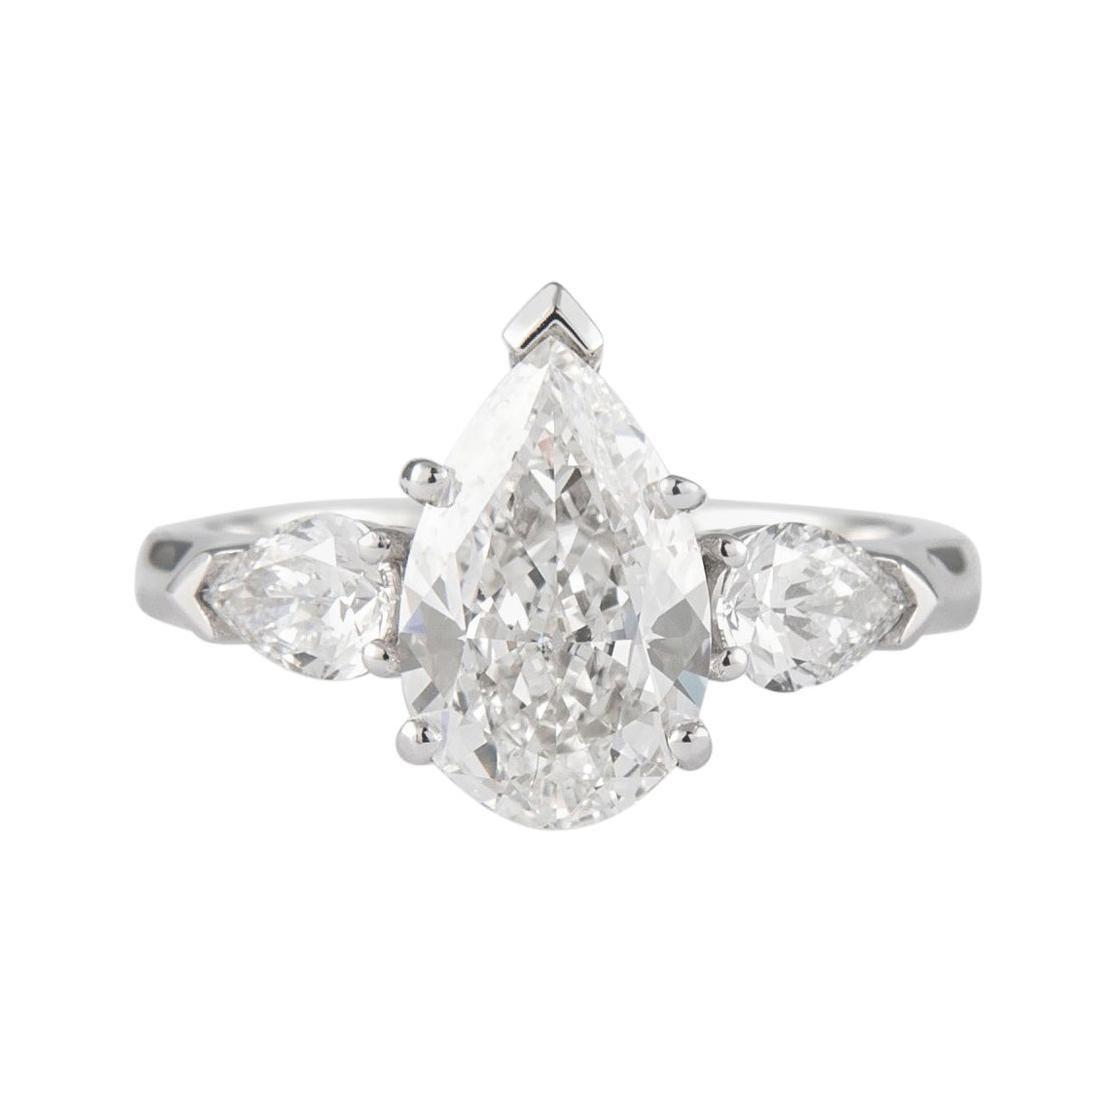 GIA Certified 2.01 Carat Pear Cut Diamond Three-Stone Ring Platinum